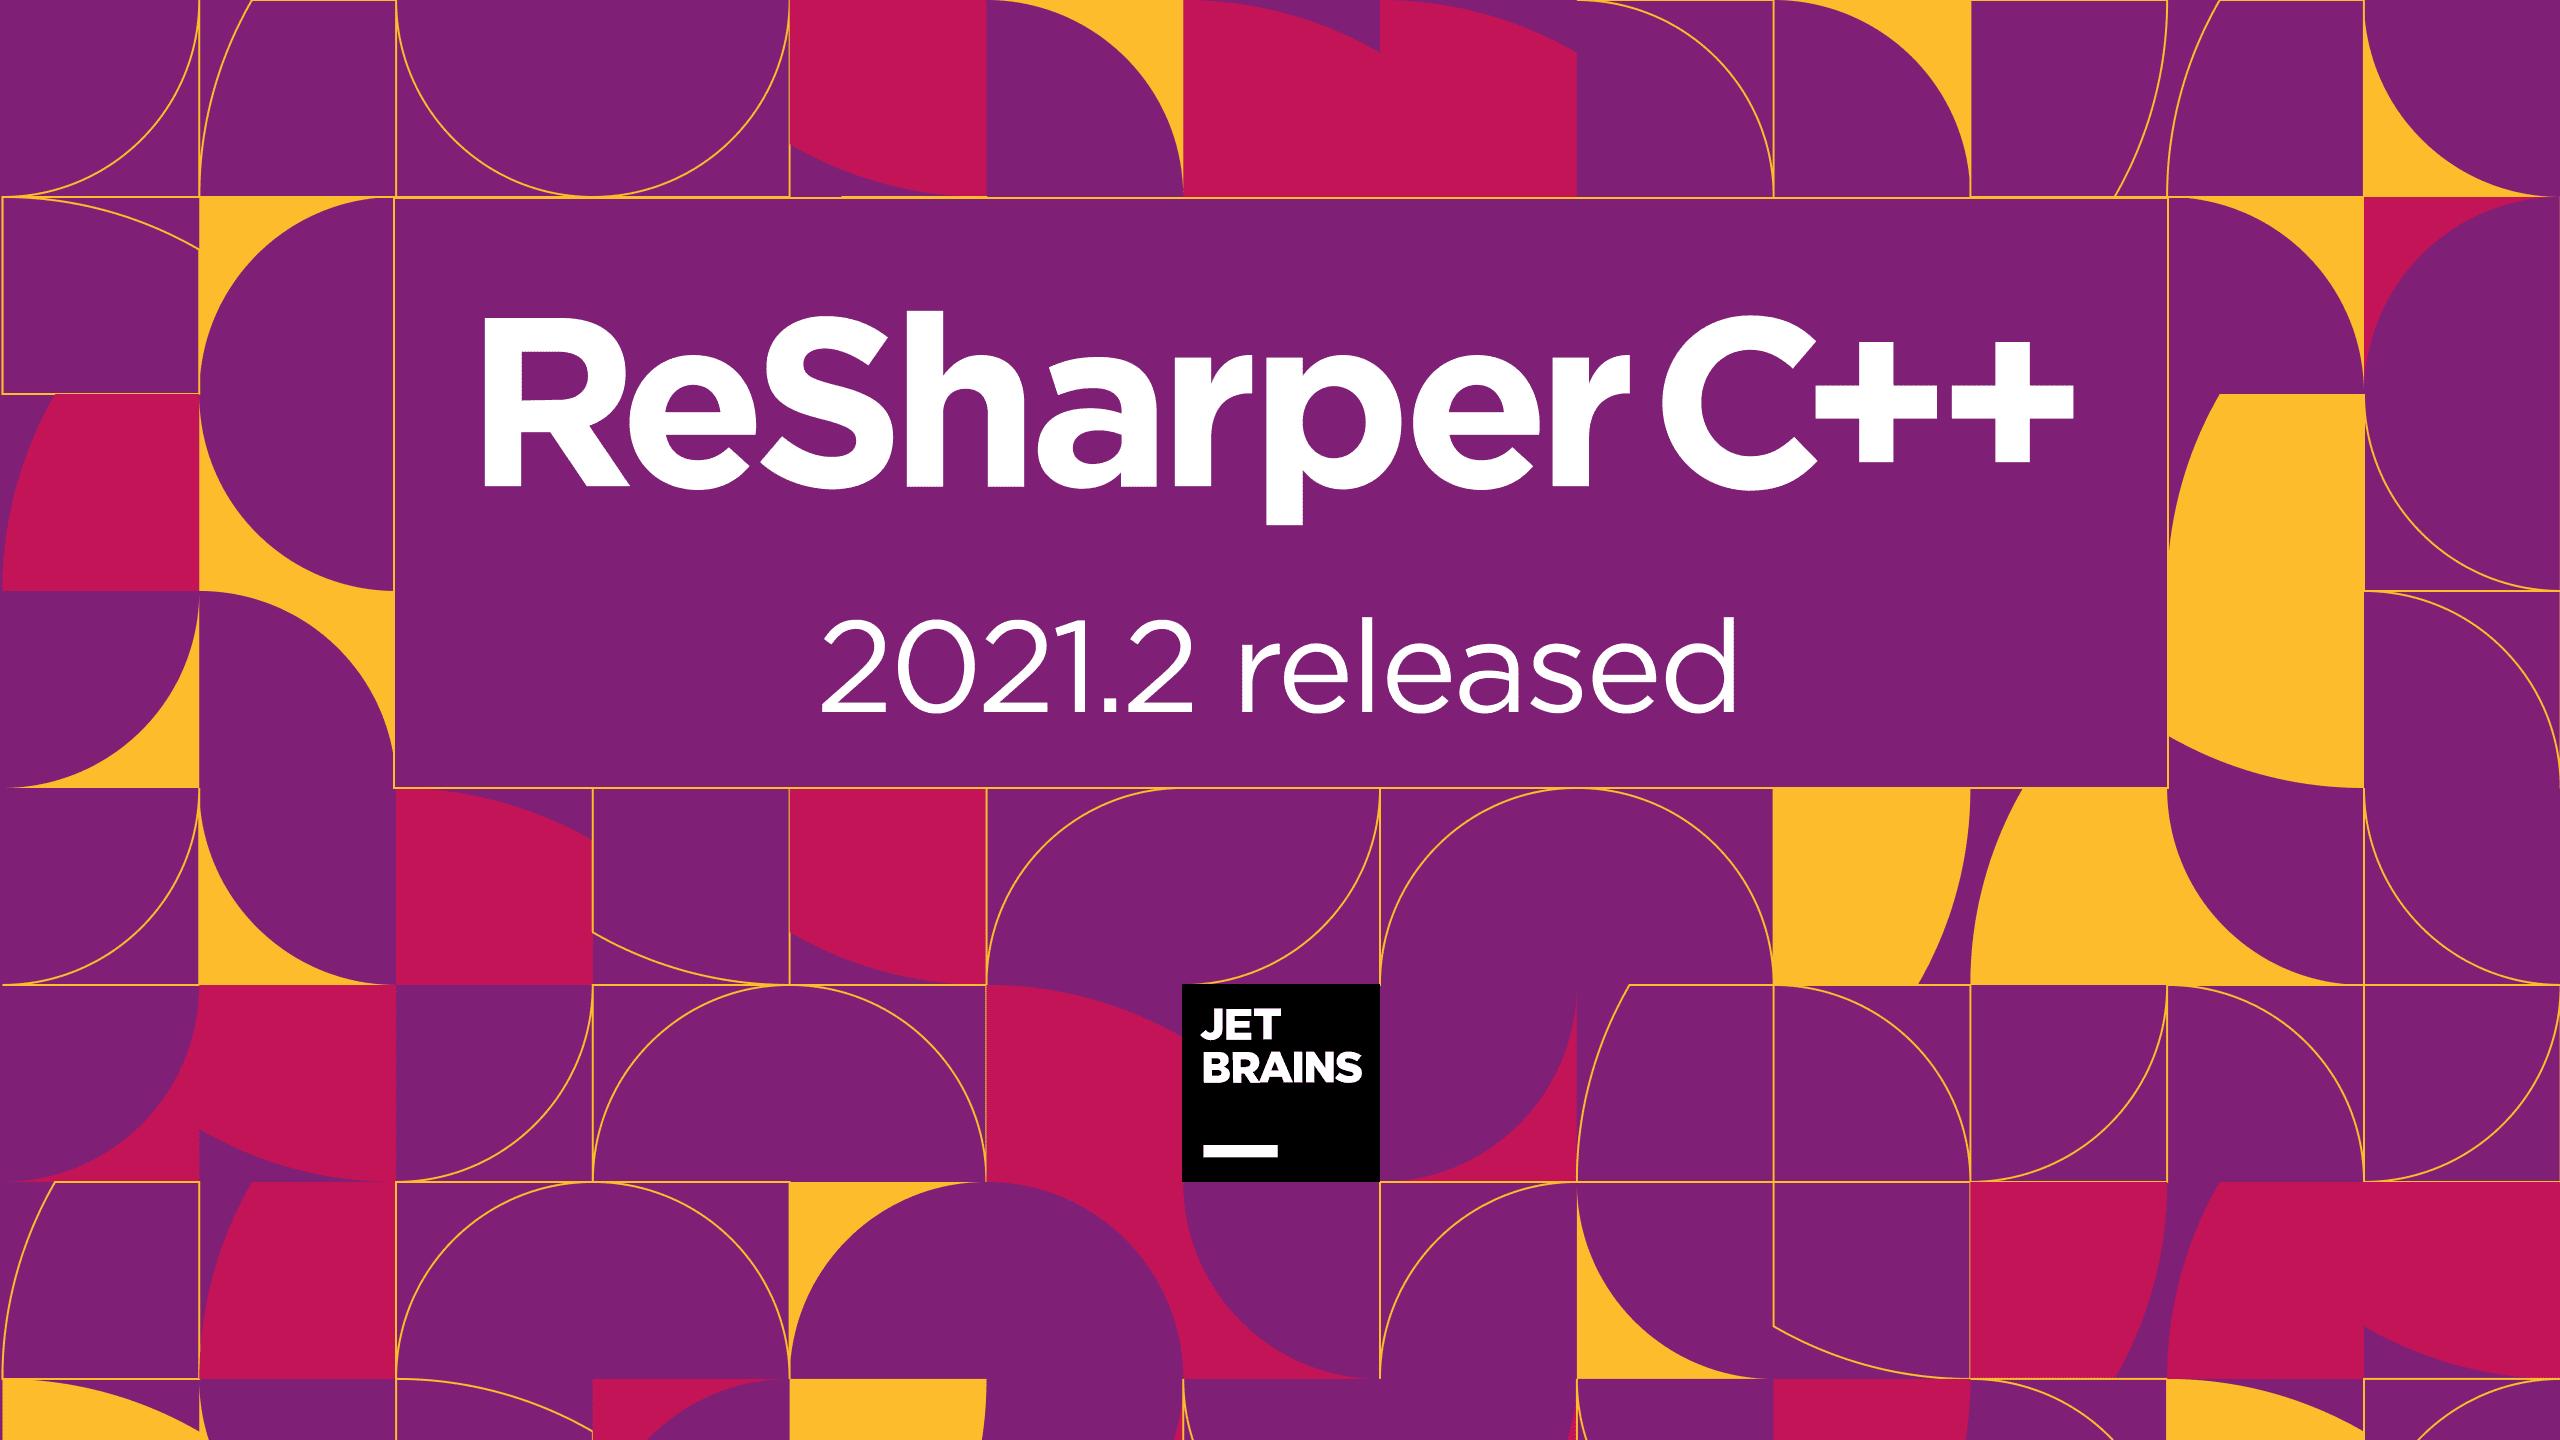 ReSharper C++ 2021.2